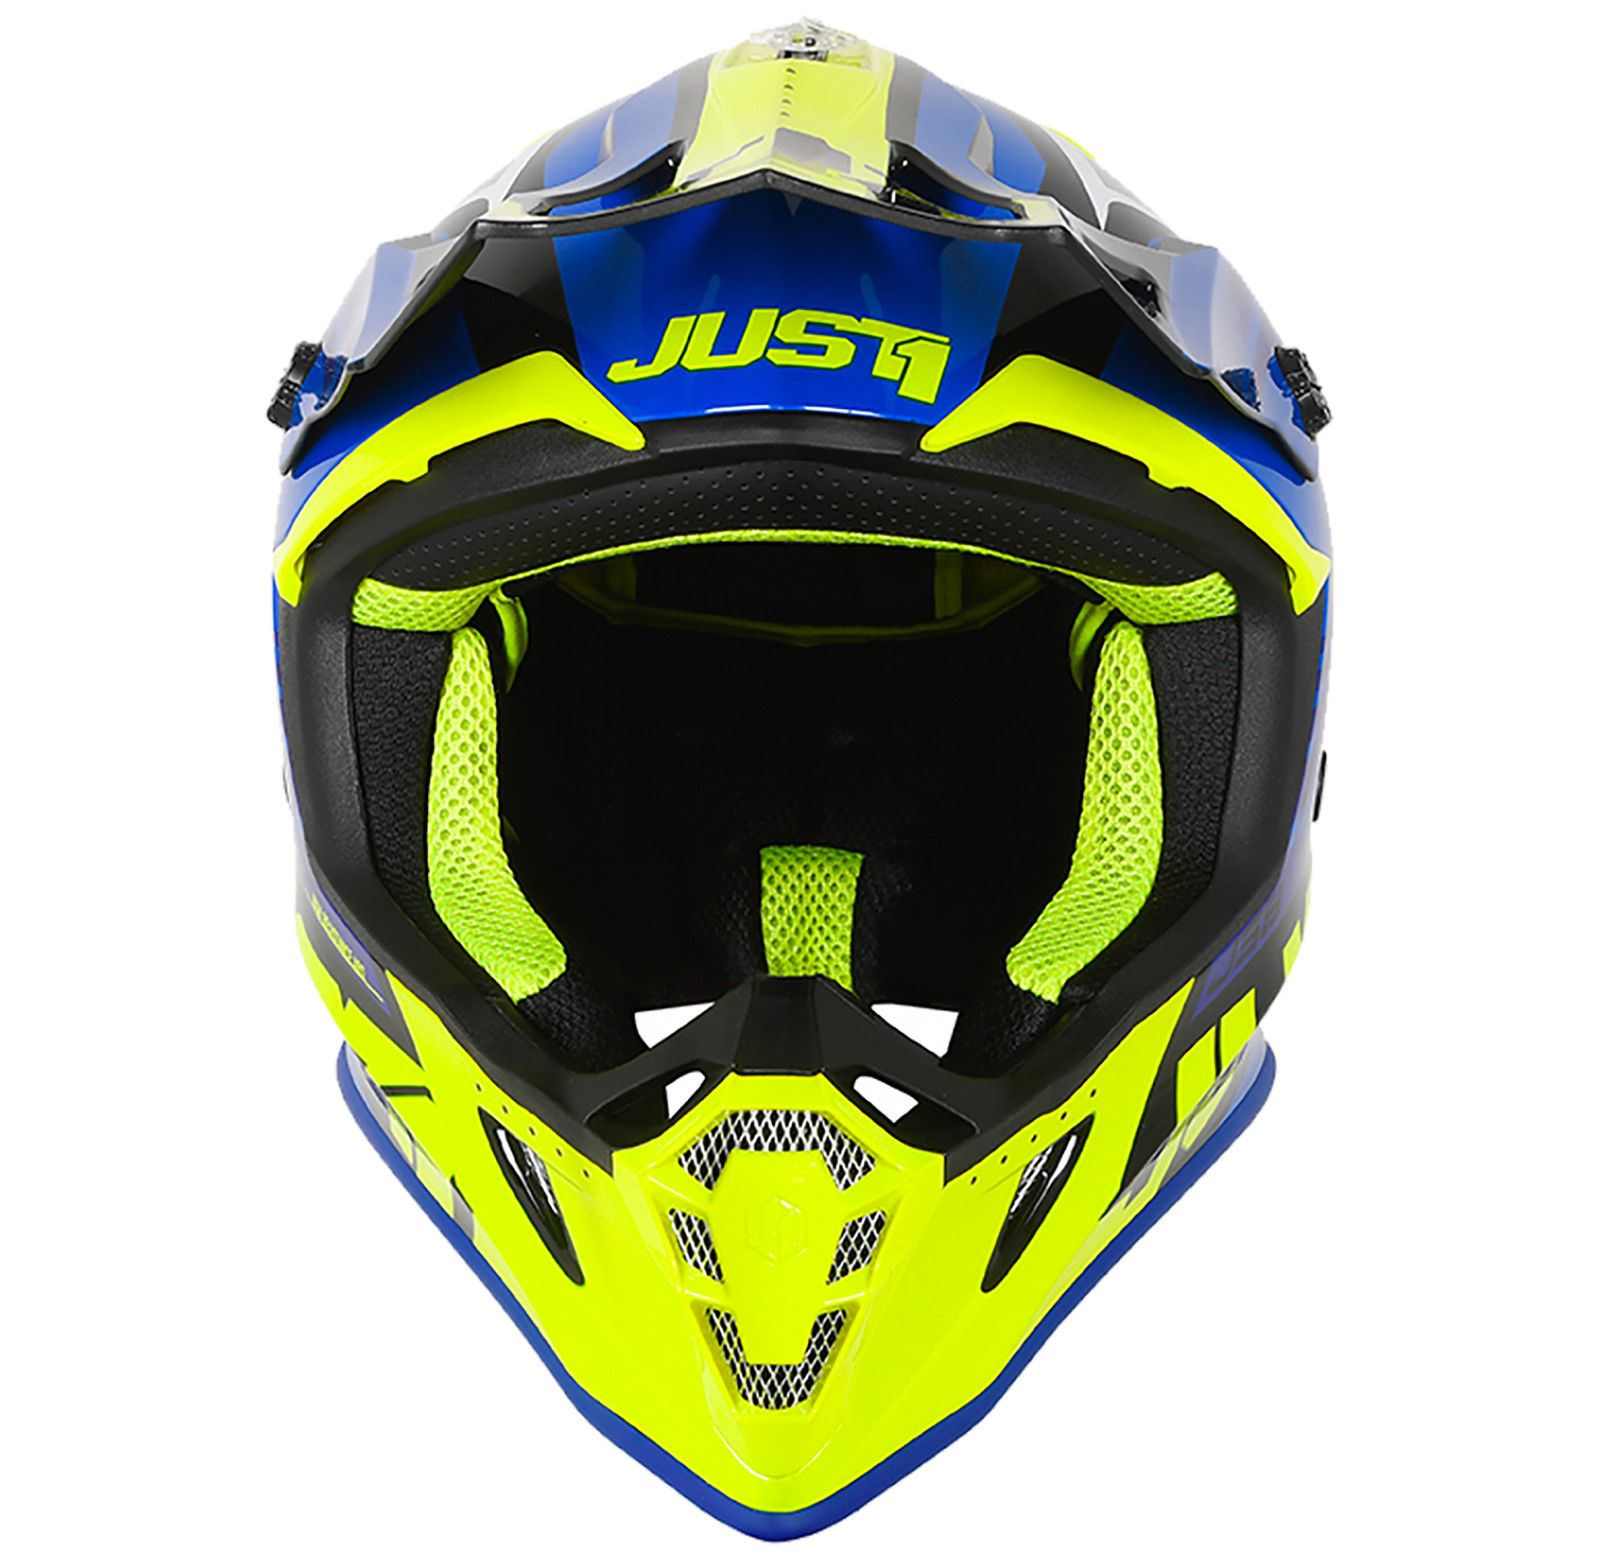 Just1-J38-Blade-Helmet-Motocross-Enduro-MX-ATV-Motorcycle-Off-Road-Full-Face-ACU thumbnail 19